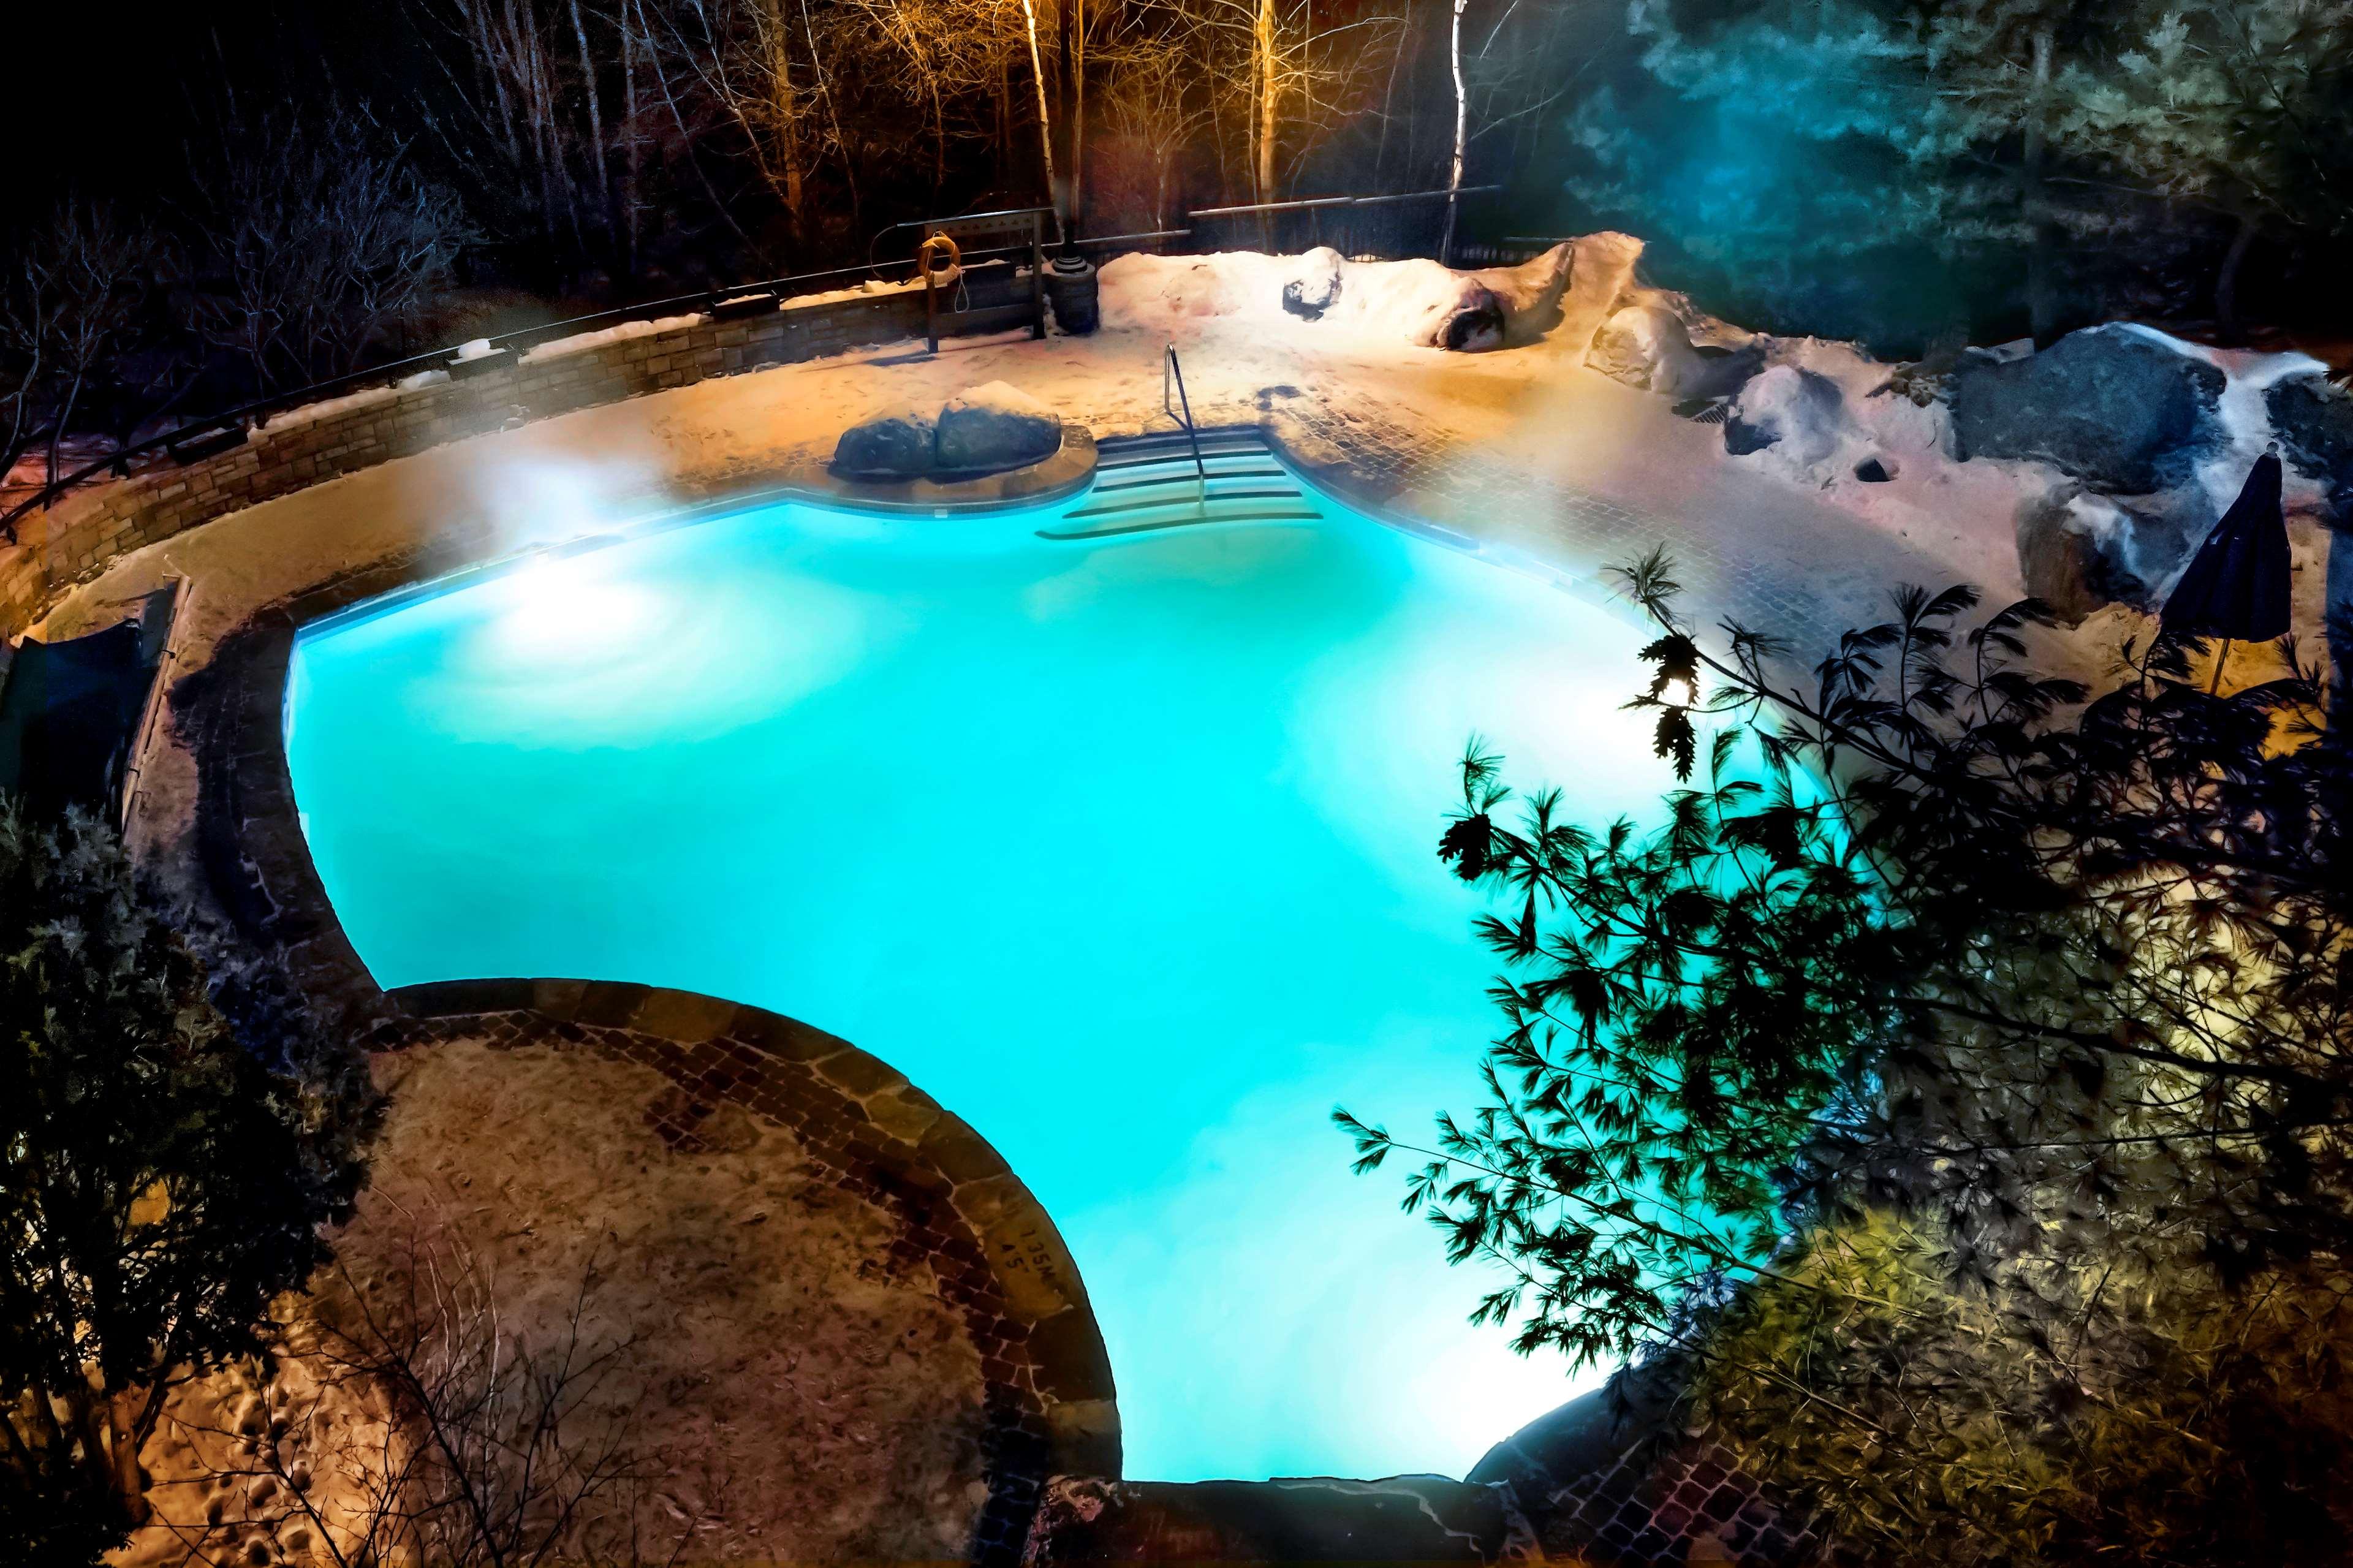 Le Westin Resort & Spa, Tremblant, Quebec à Mont Tremblant: Outdoor Saltwater Pool